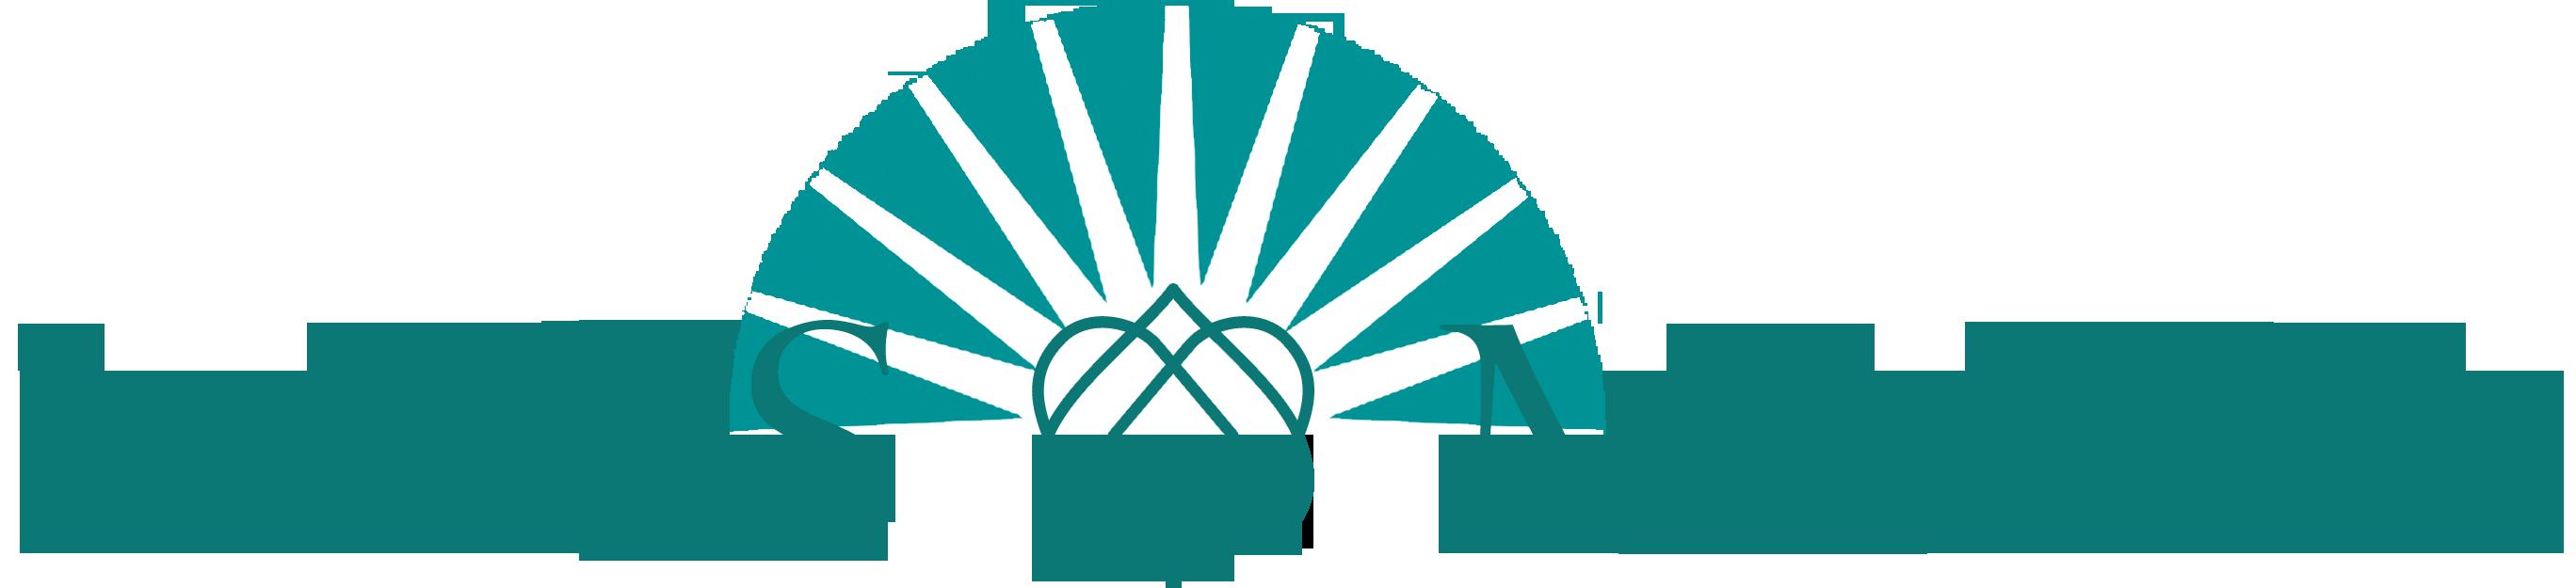 LM_logo2